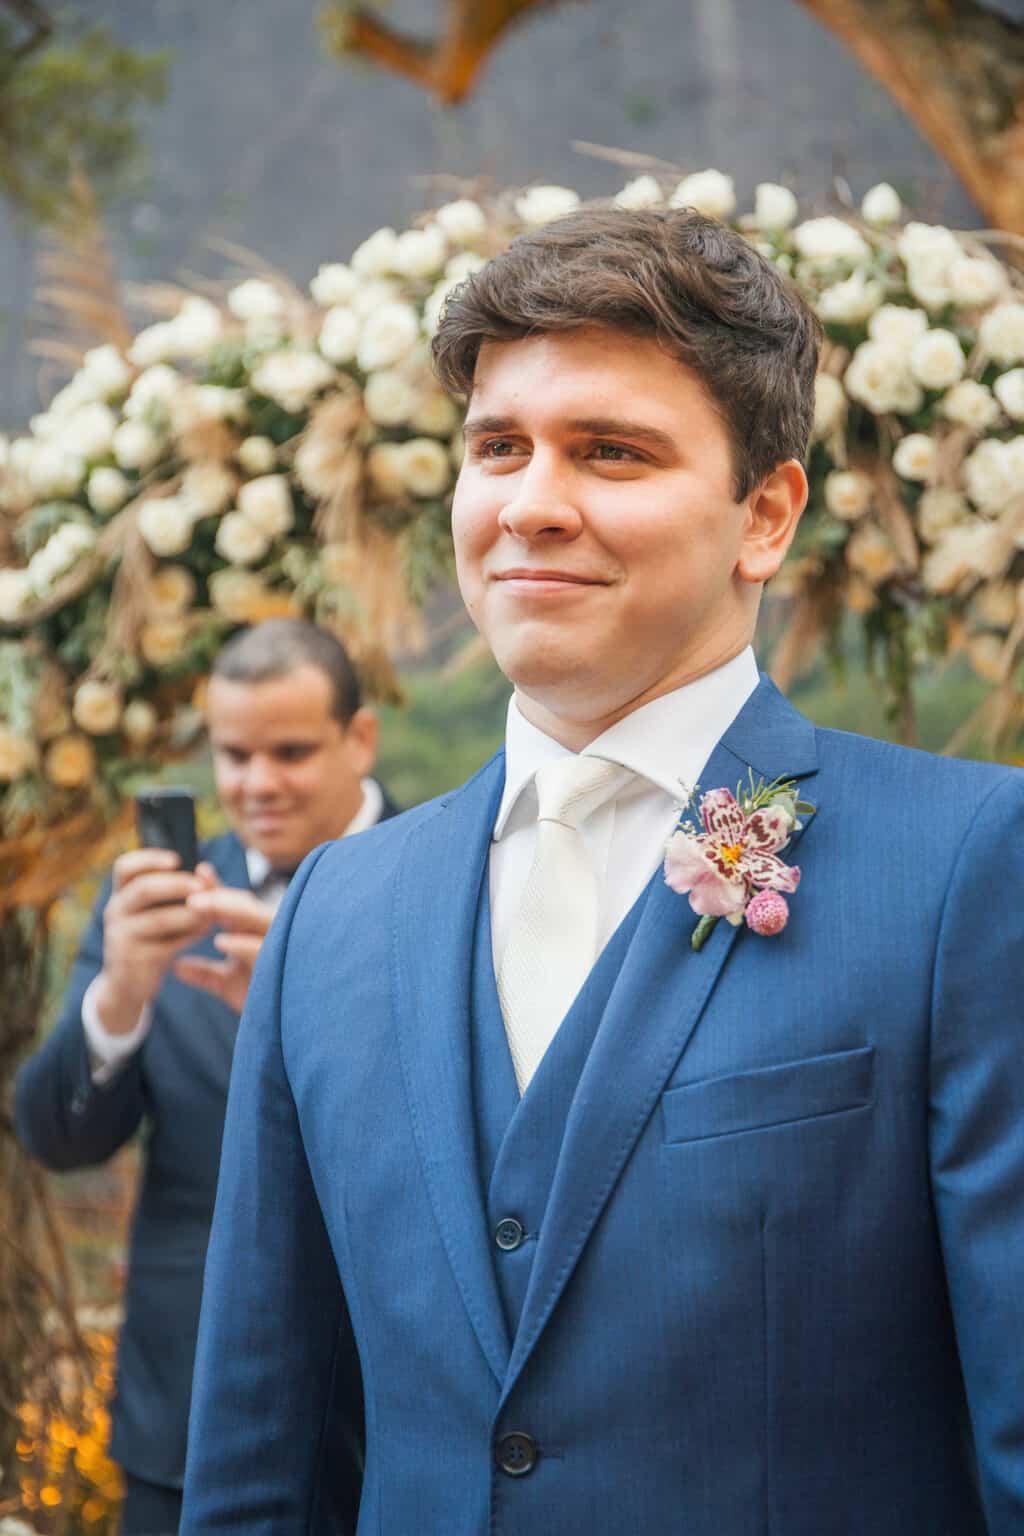 casamento-Beatriz-e-Joao-Fernando-cerimonia-ao-ar-livre-entrada-da-noiva-Itaipava-Locanda-Della-Mimosa-Thienny-Tammis131